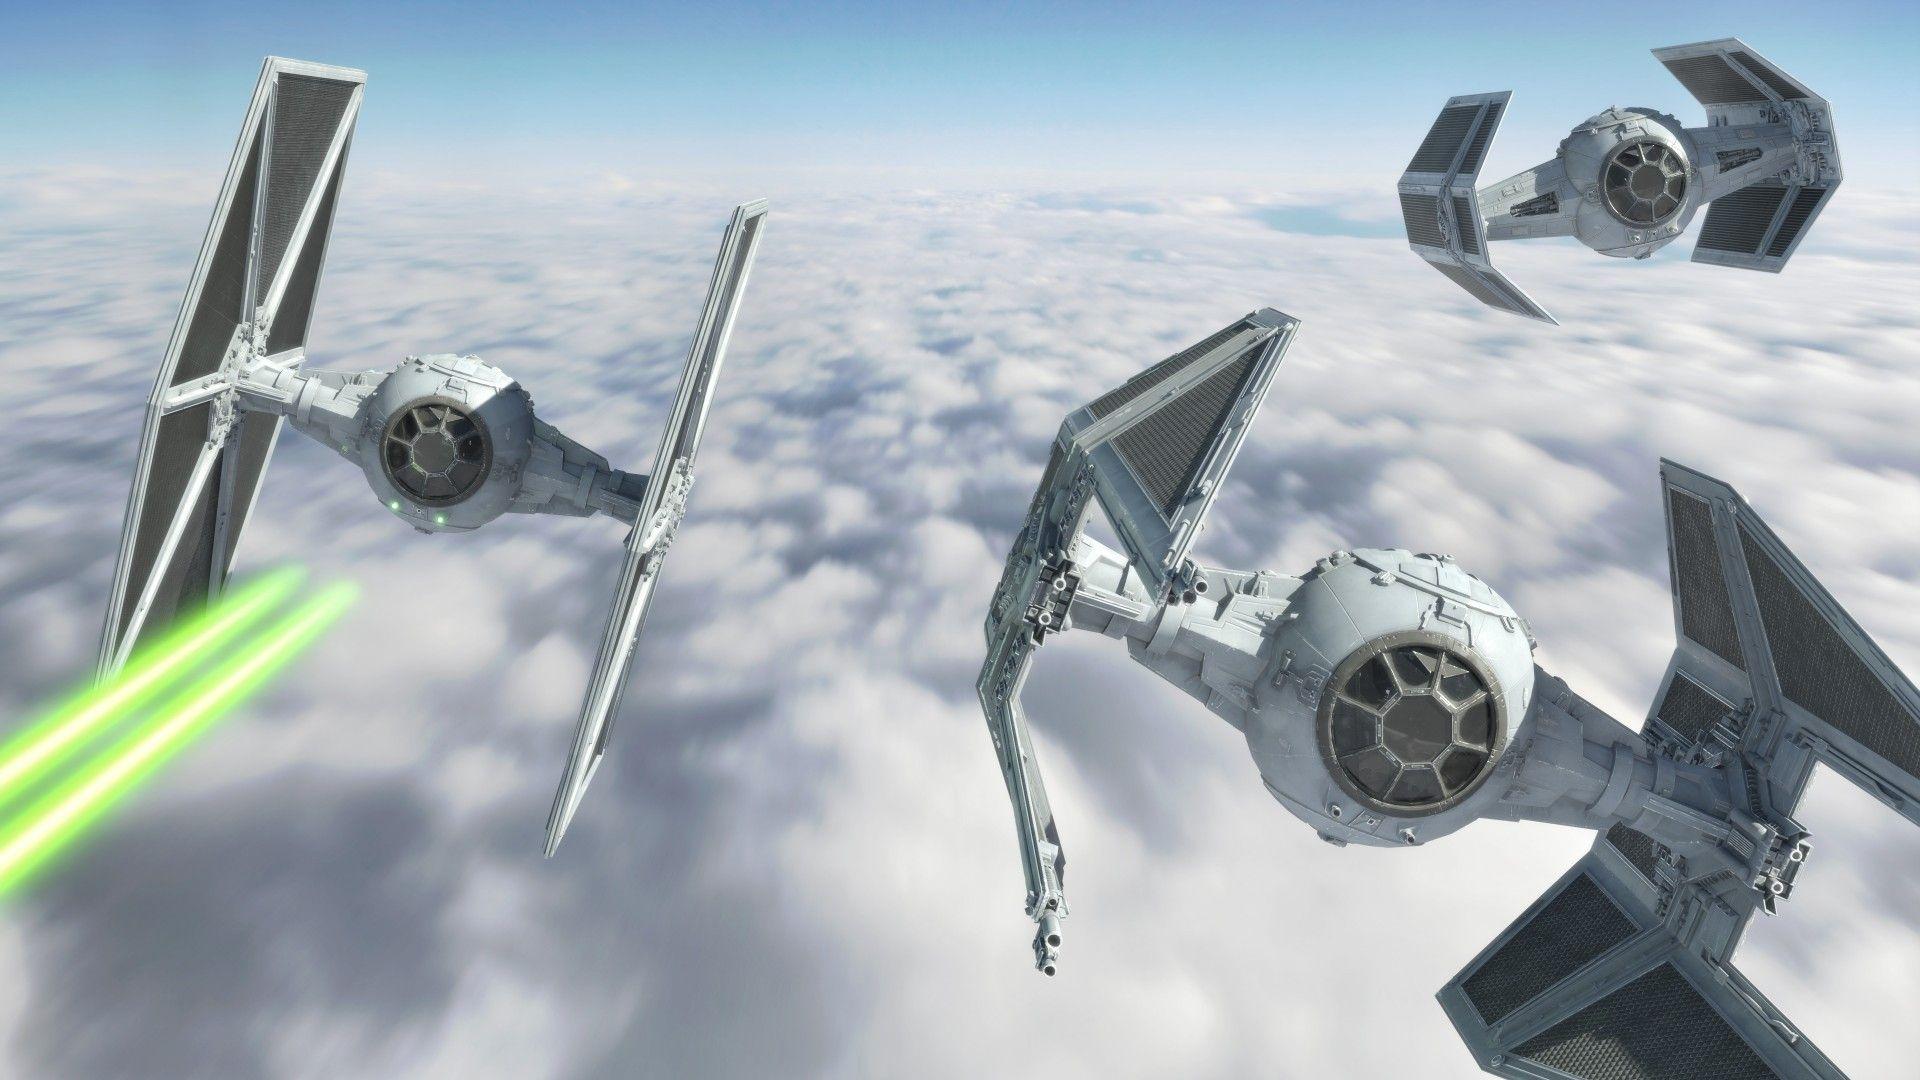 Star Wars #starwars tie fighter Interceptor | Star wars ships, Military star, Star wars concept art